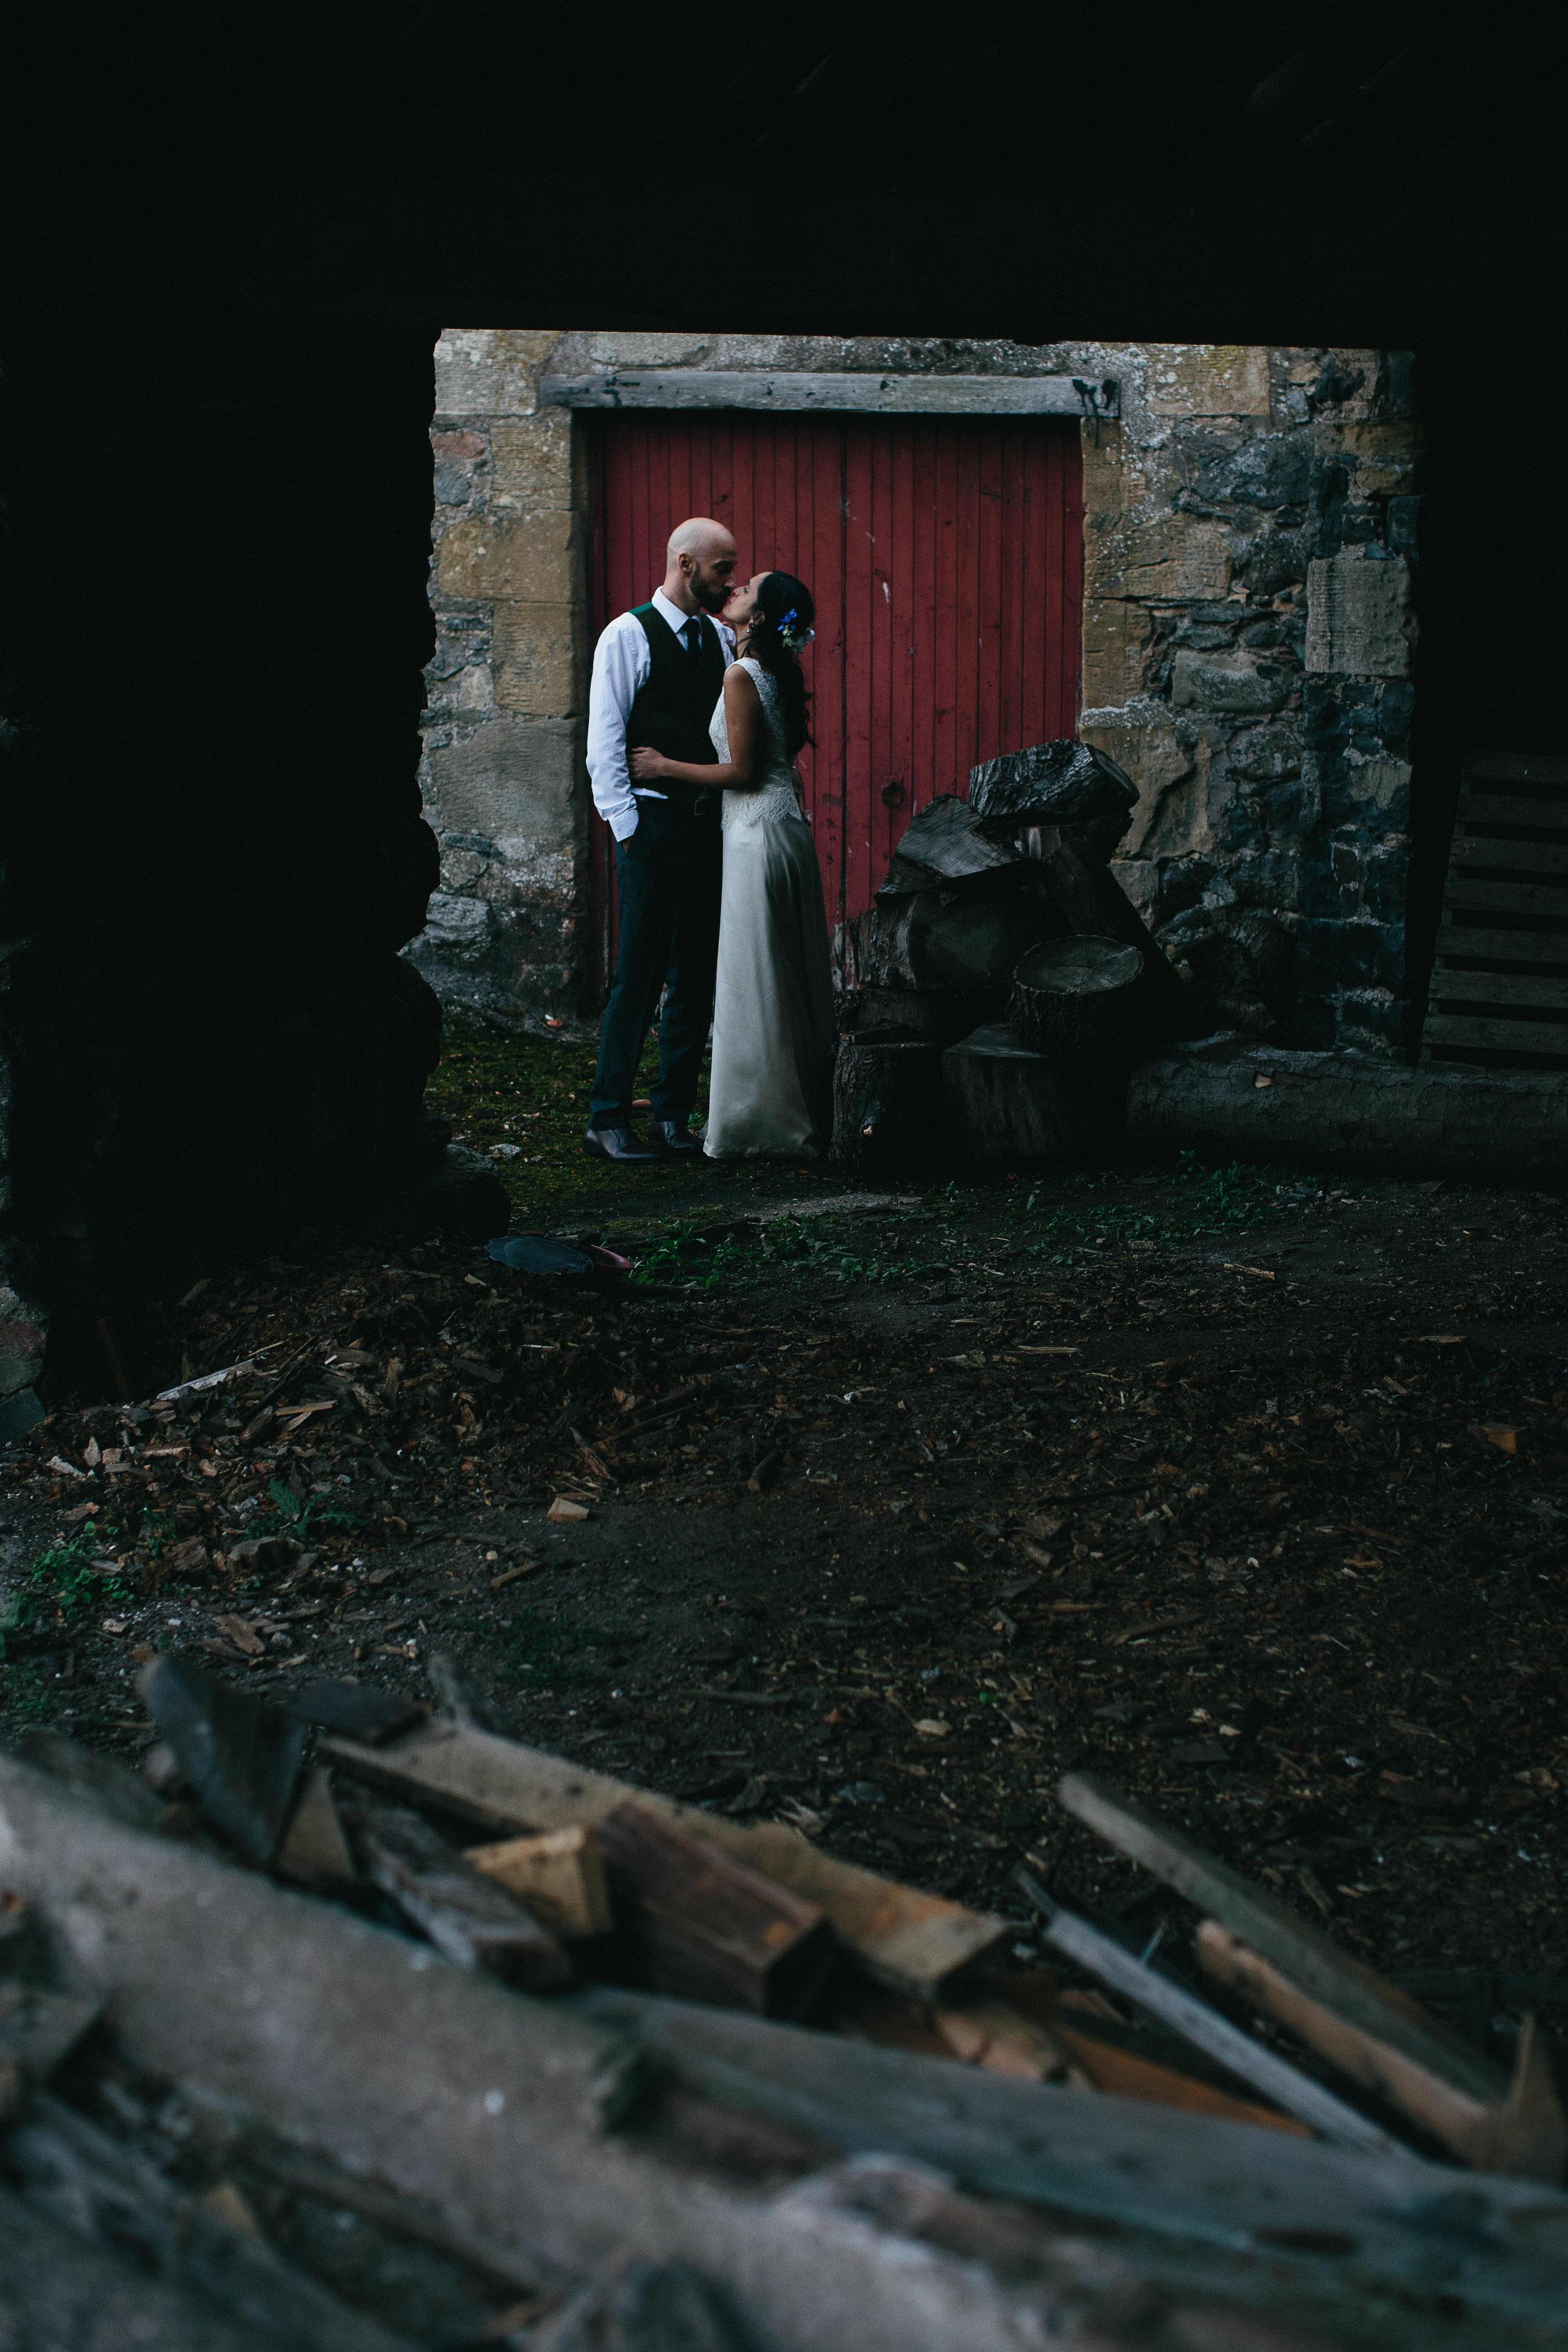 Quirky Wedding Photographer Scotland Glasgow Edinburgh Mirrorbox 002.jpg